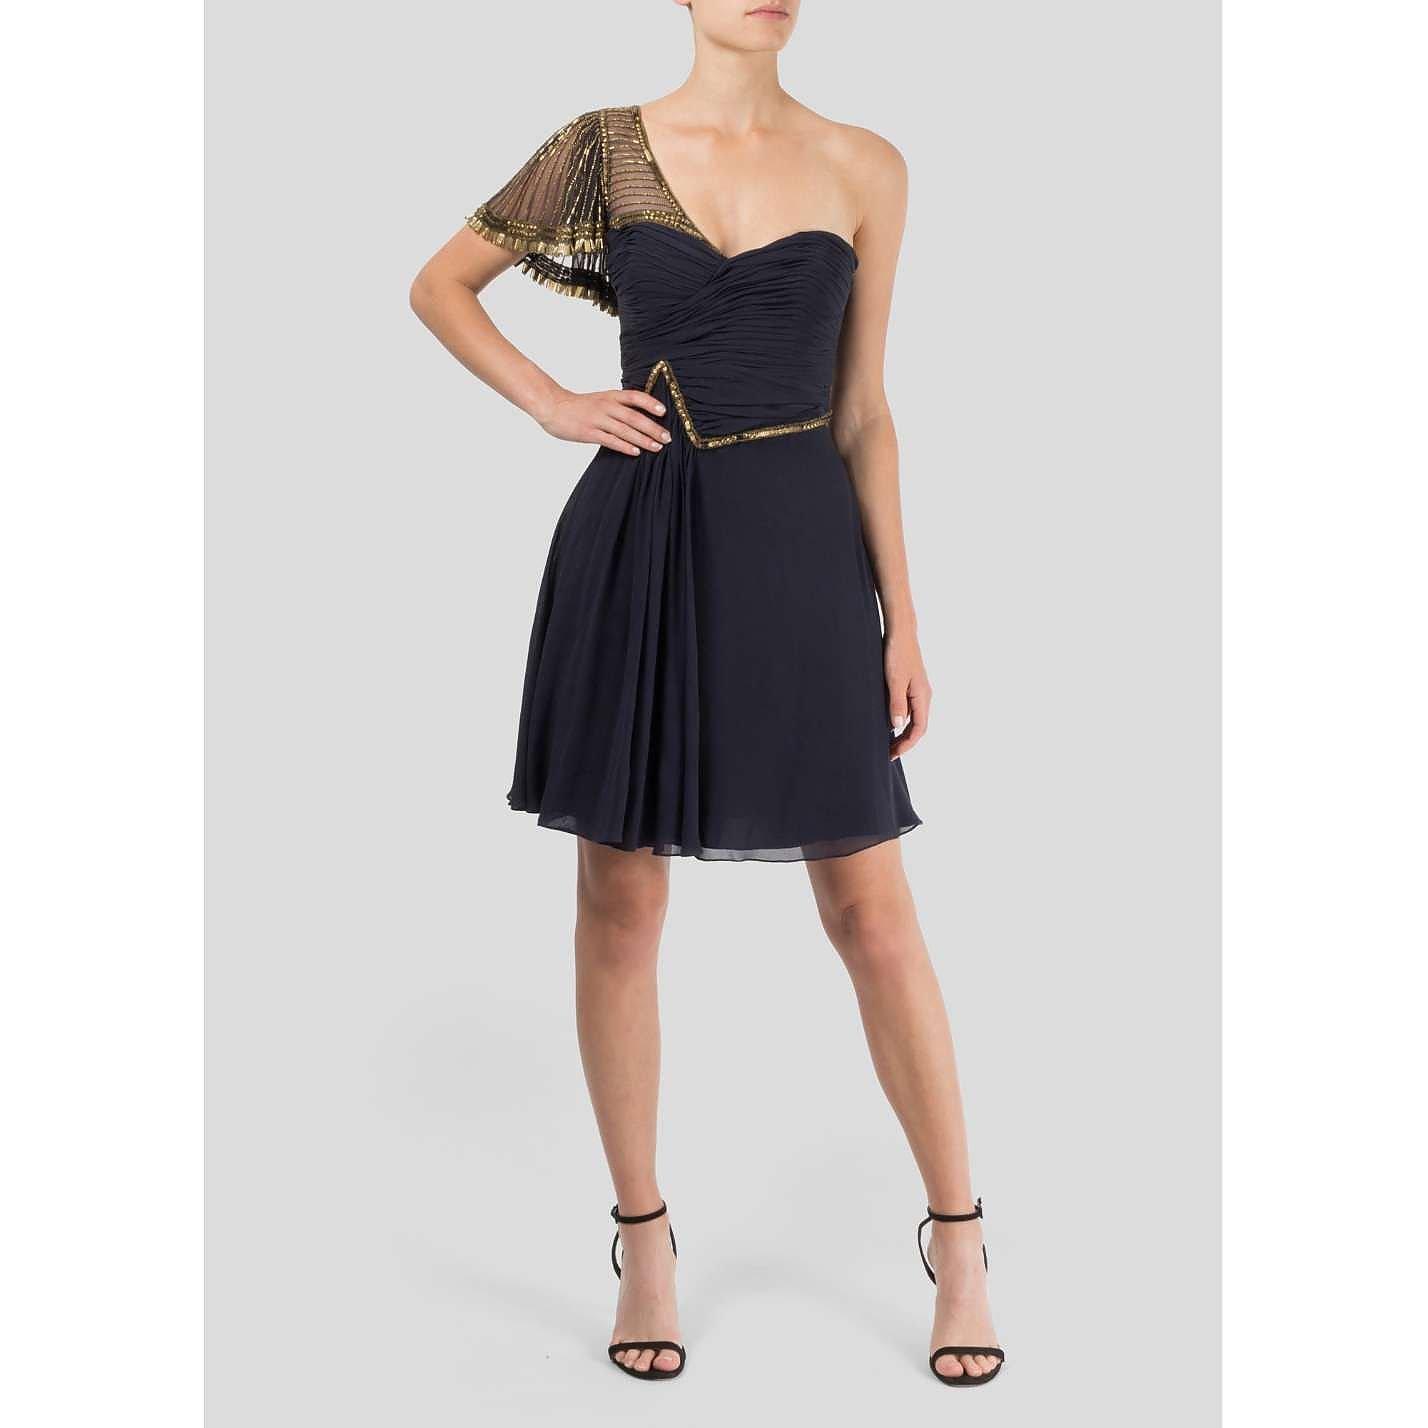 Temperley London One Shoulder Mini Dress